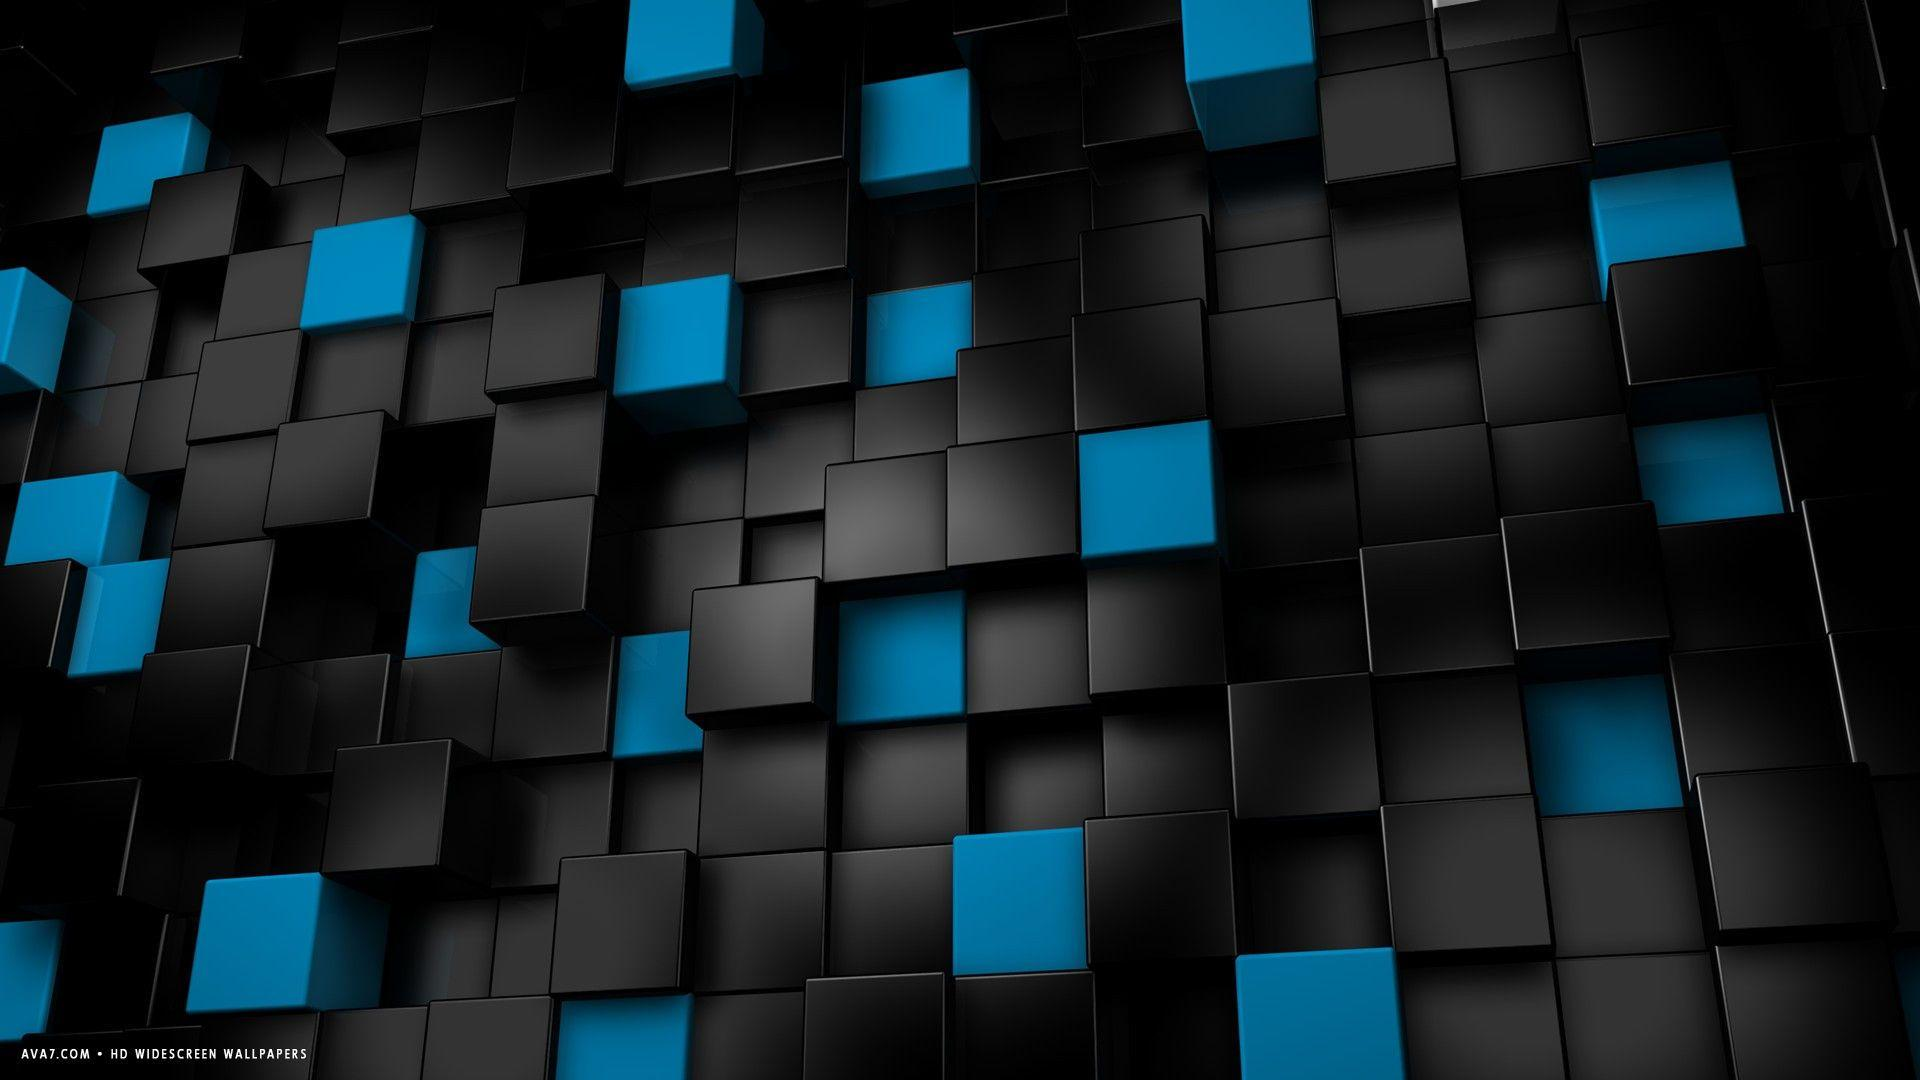 Hd widescreen wallpapers 1080p wallpaper cave